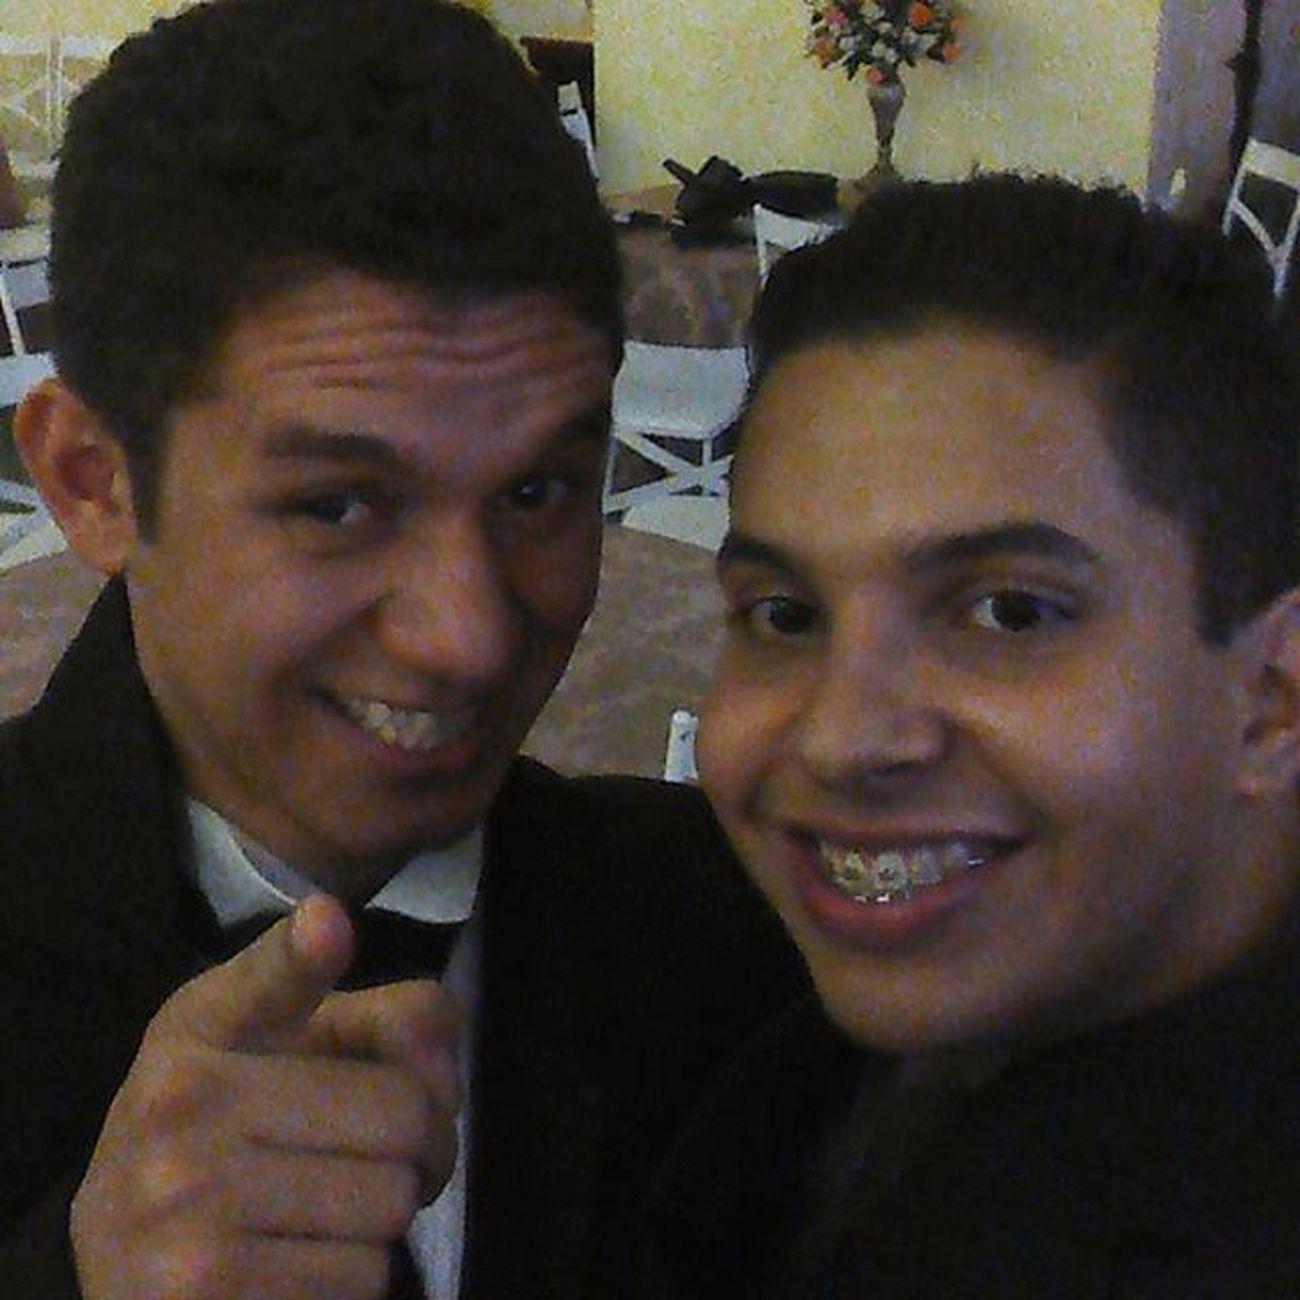 A protocolar selfie com o Noivo! CasamentoAnaEWendellEuFui MeuBrotherCasou GameOverBro CasamentoTopDasGaláxias FelicidadesIrmão TodaSorteDeBençãosPraVocêMano